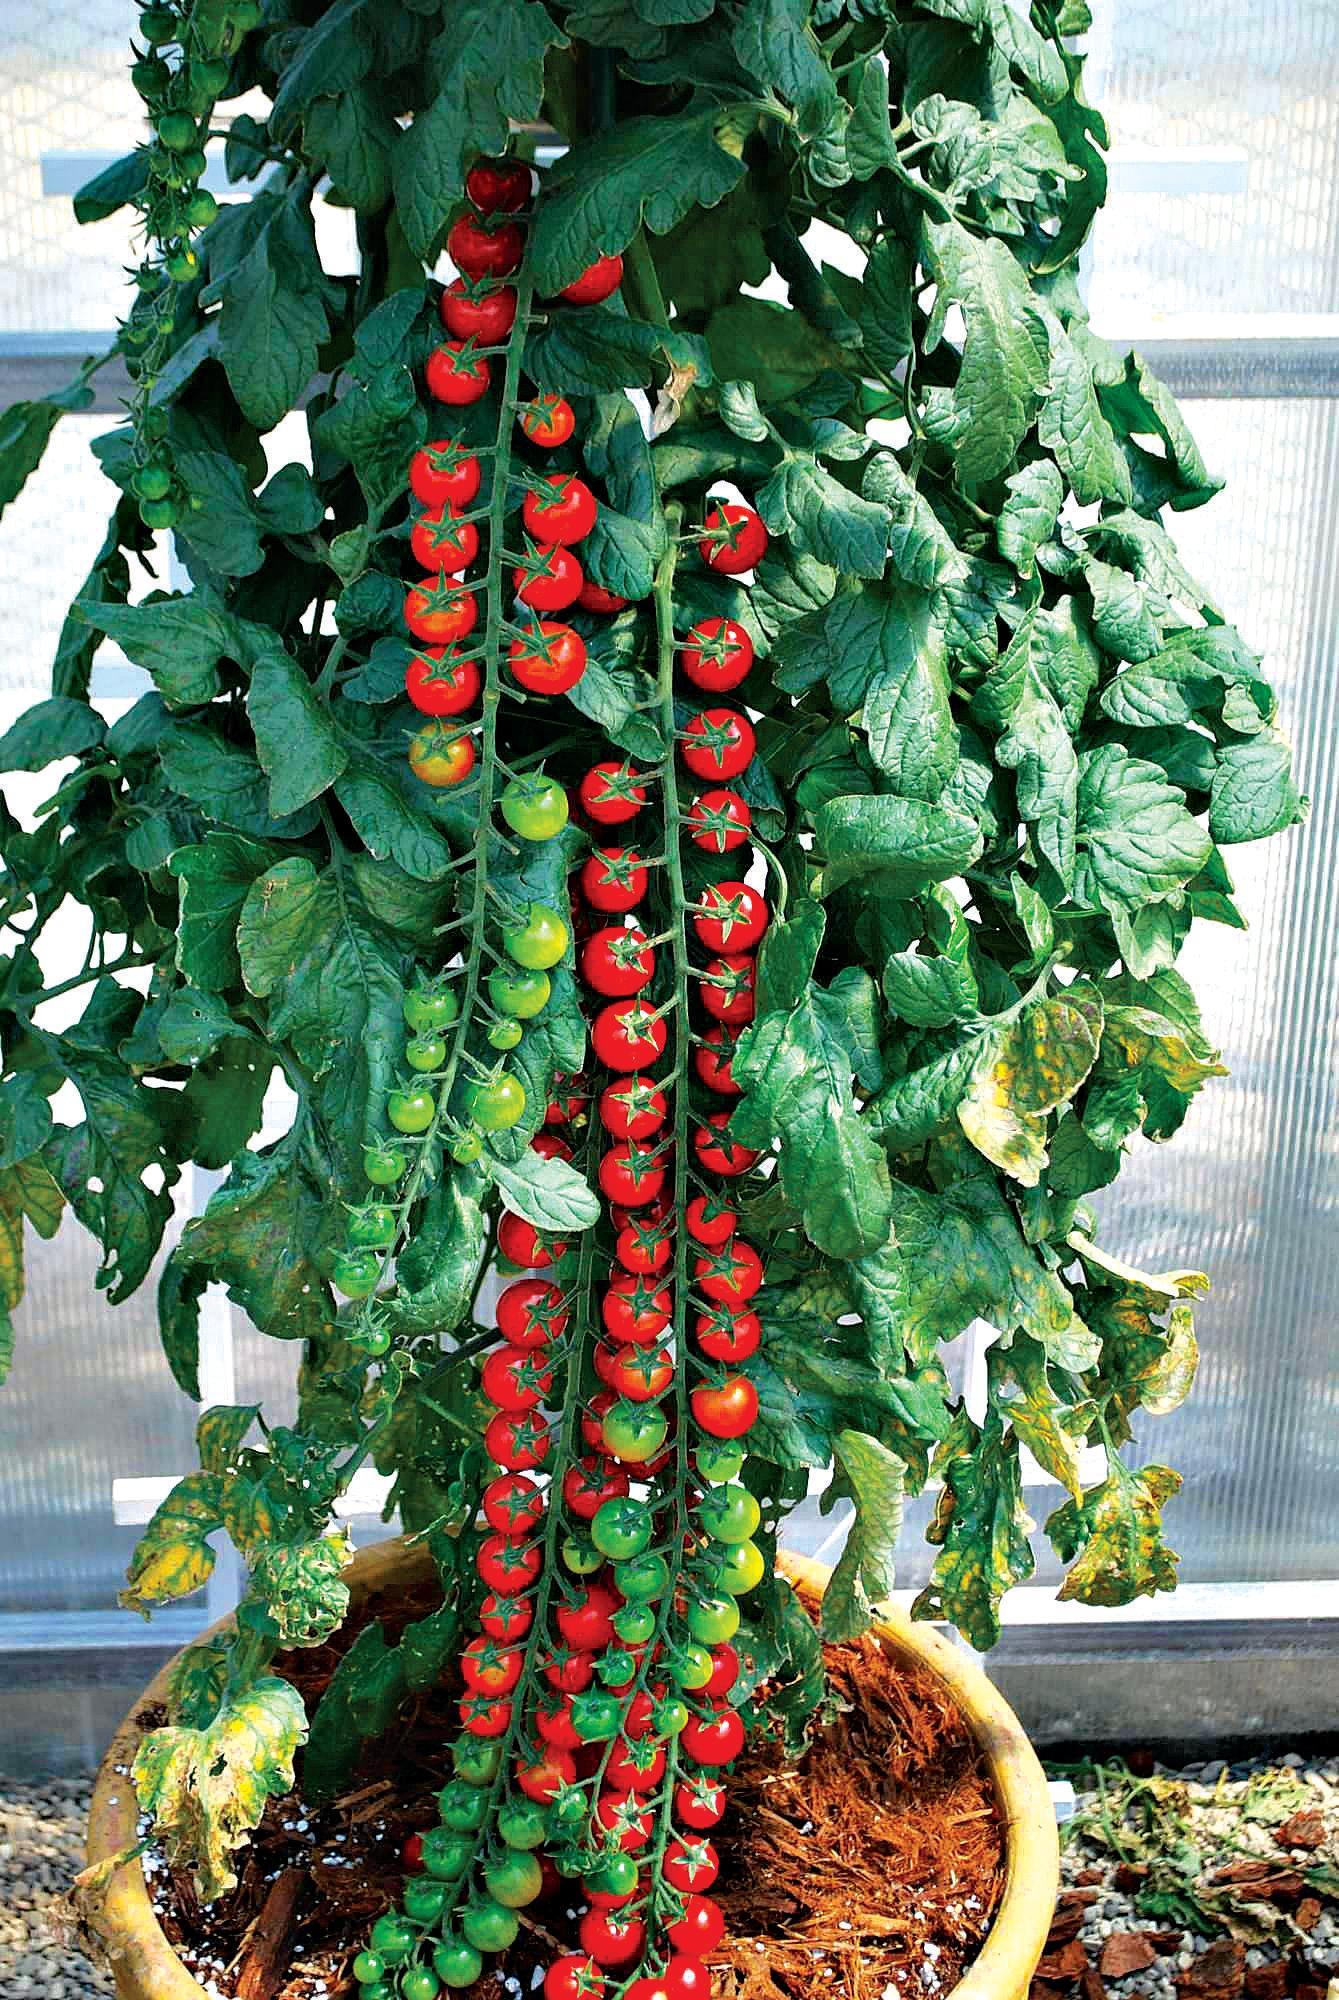 Planter Des Tomates En Pot top picks for home-grown tomatoes | queensland times